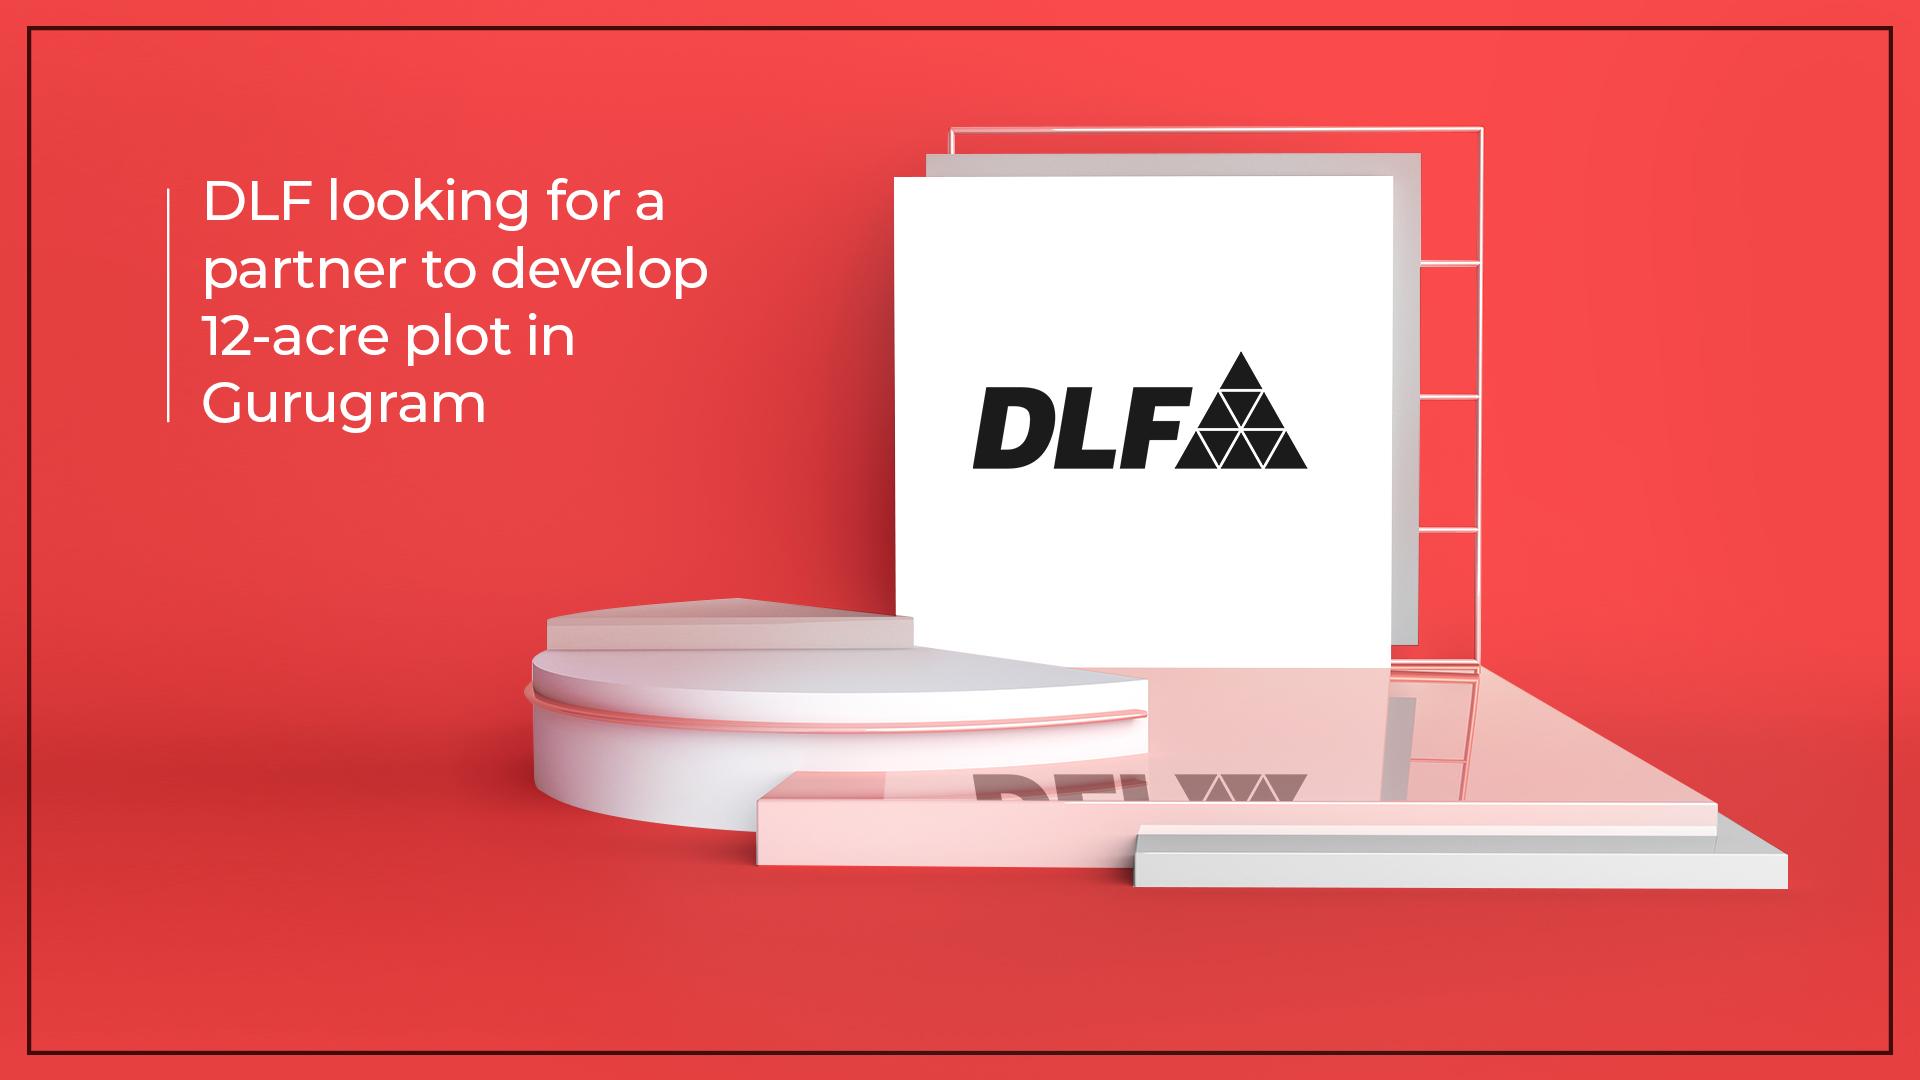 DLF hunts for a strategic partner to develop Gurugram's 12-acre plot